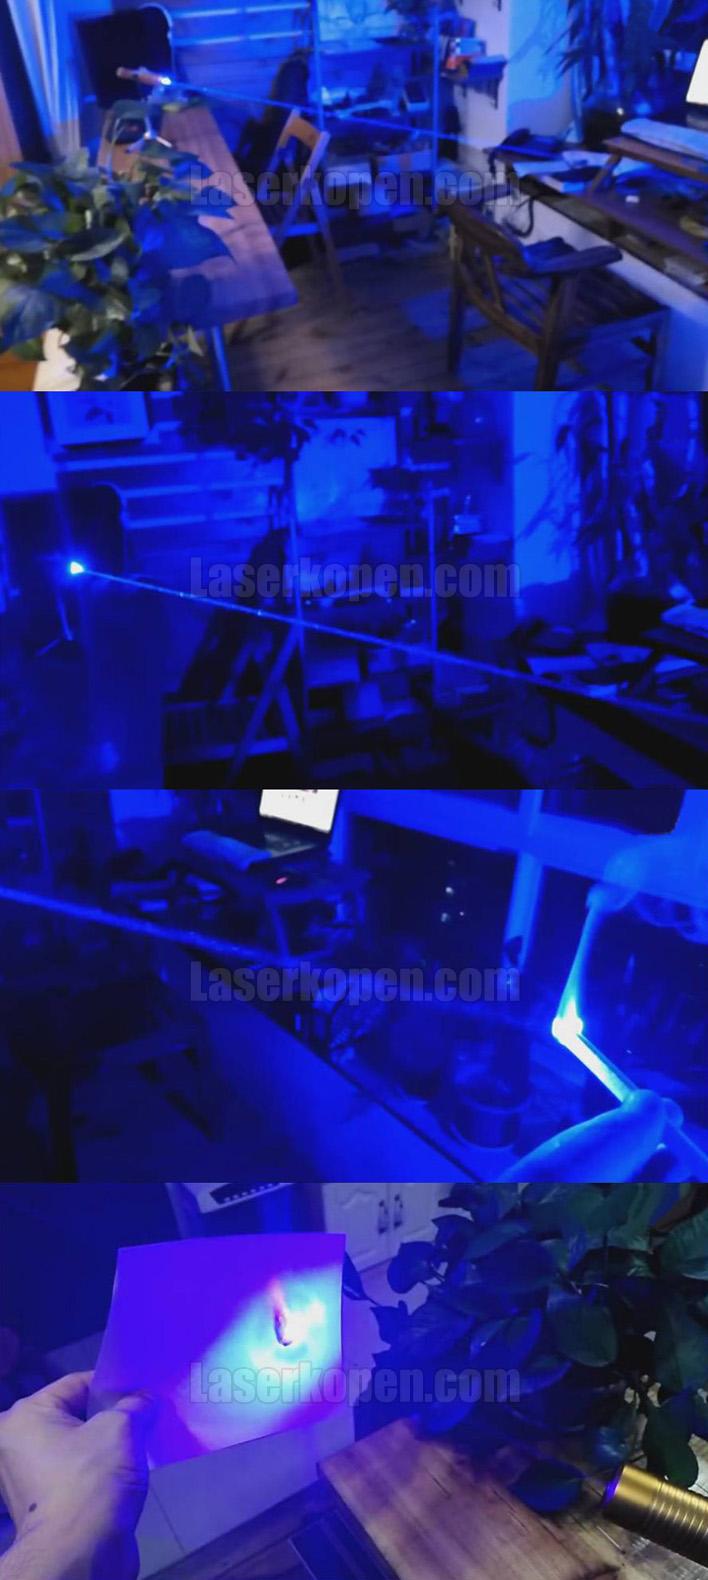 blauwe laserpen